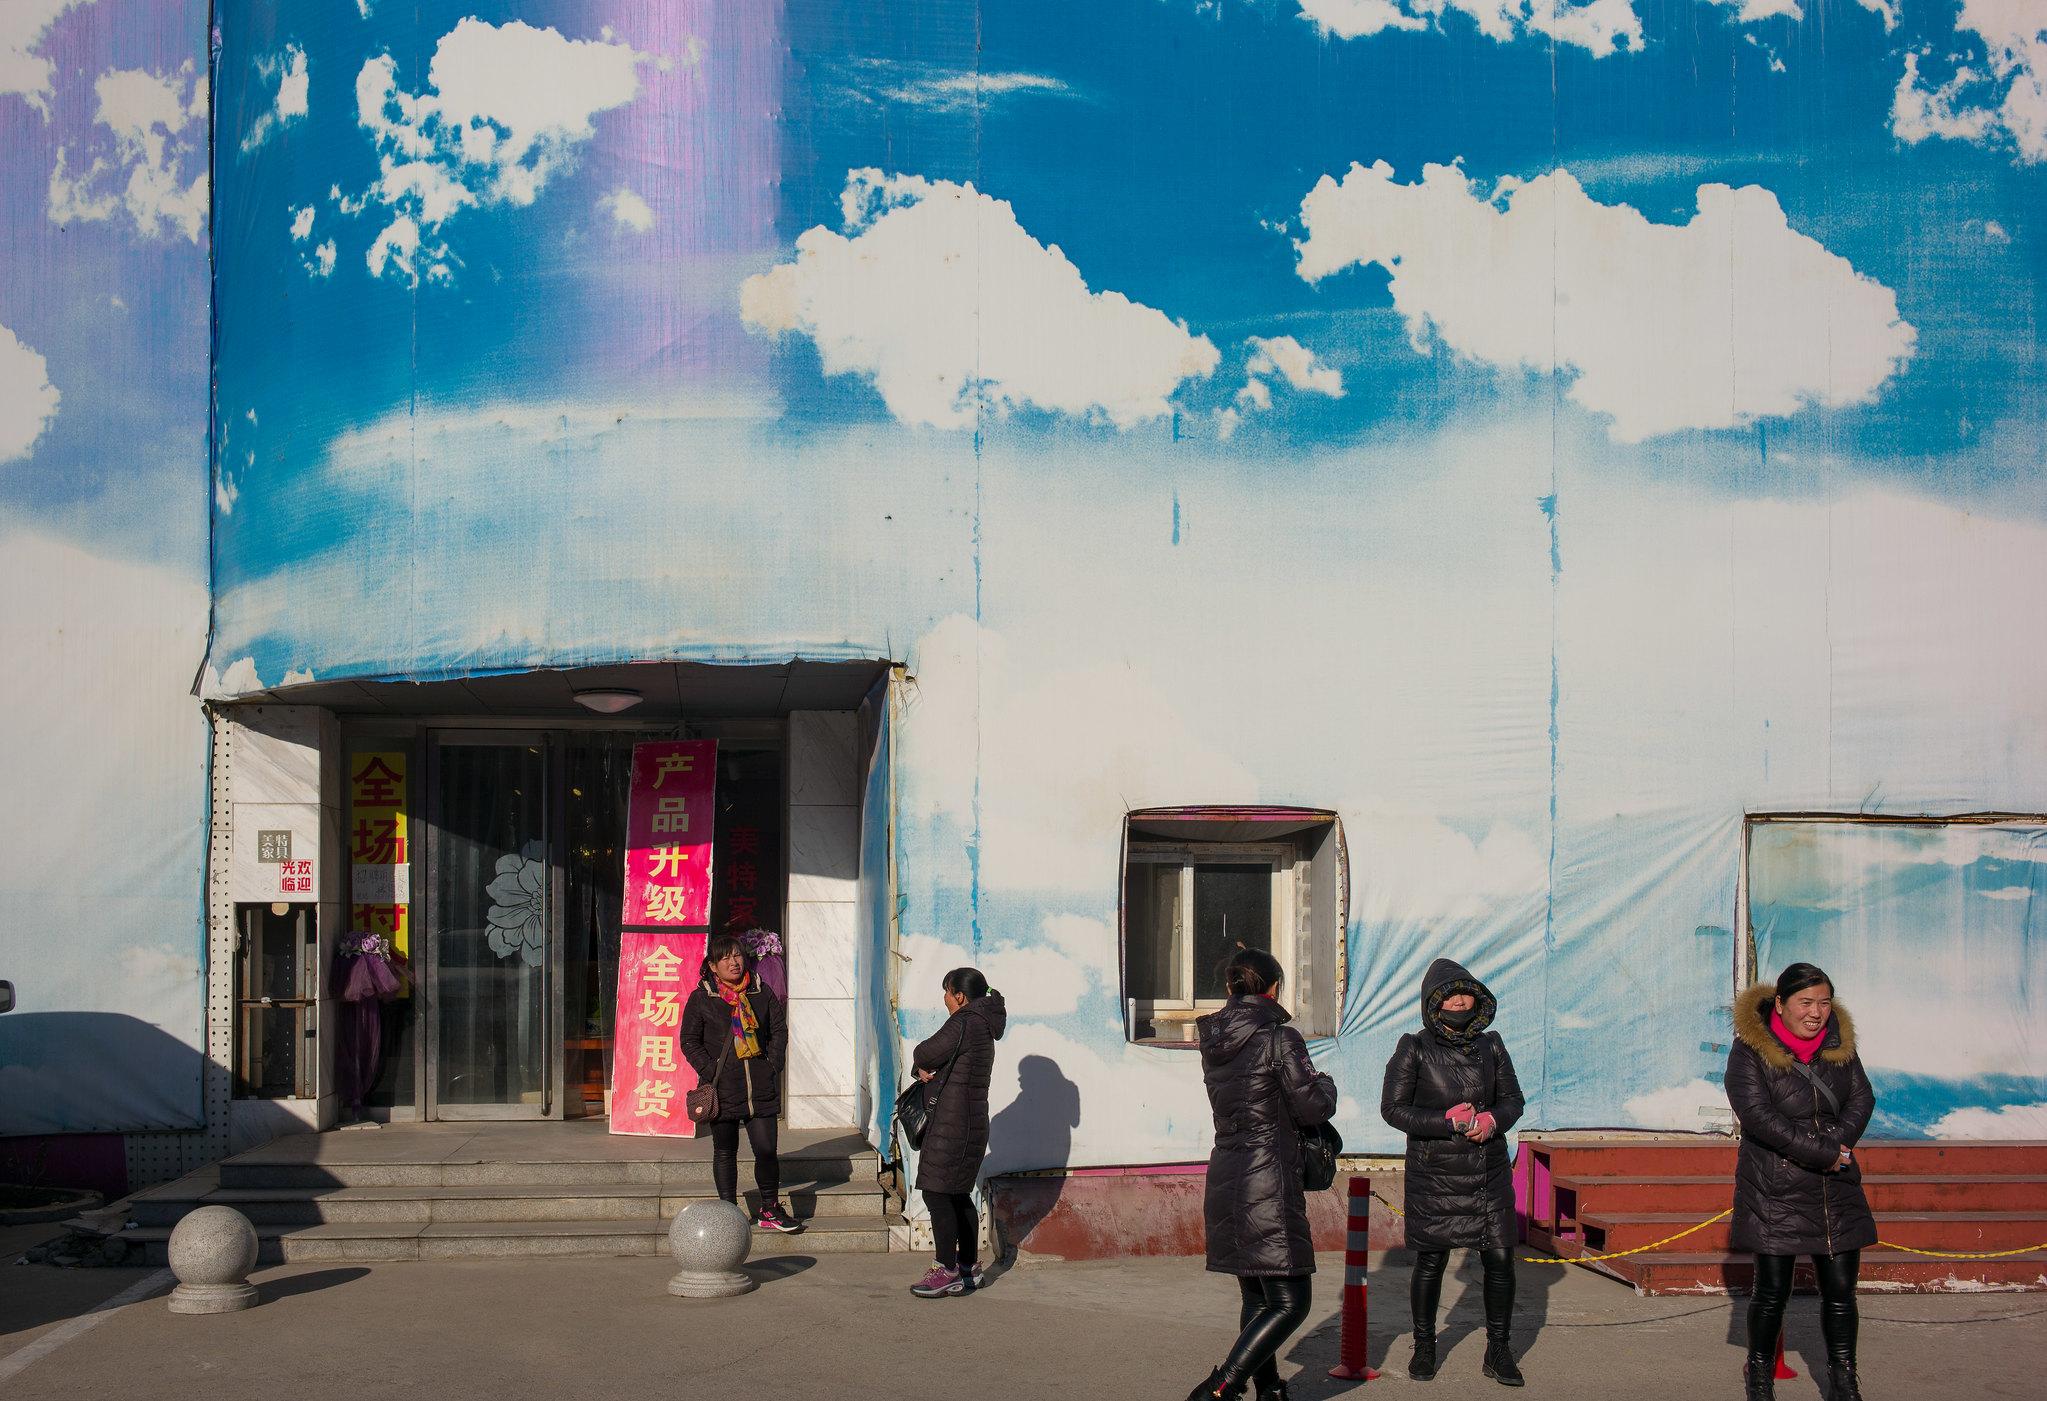 nie Smog - immer strahlend blauer Himmel